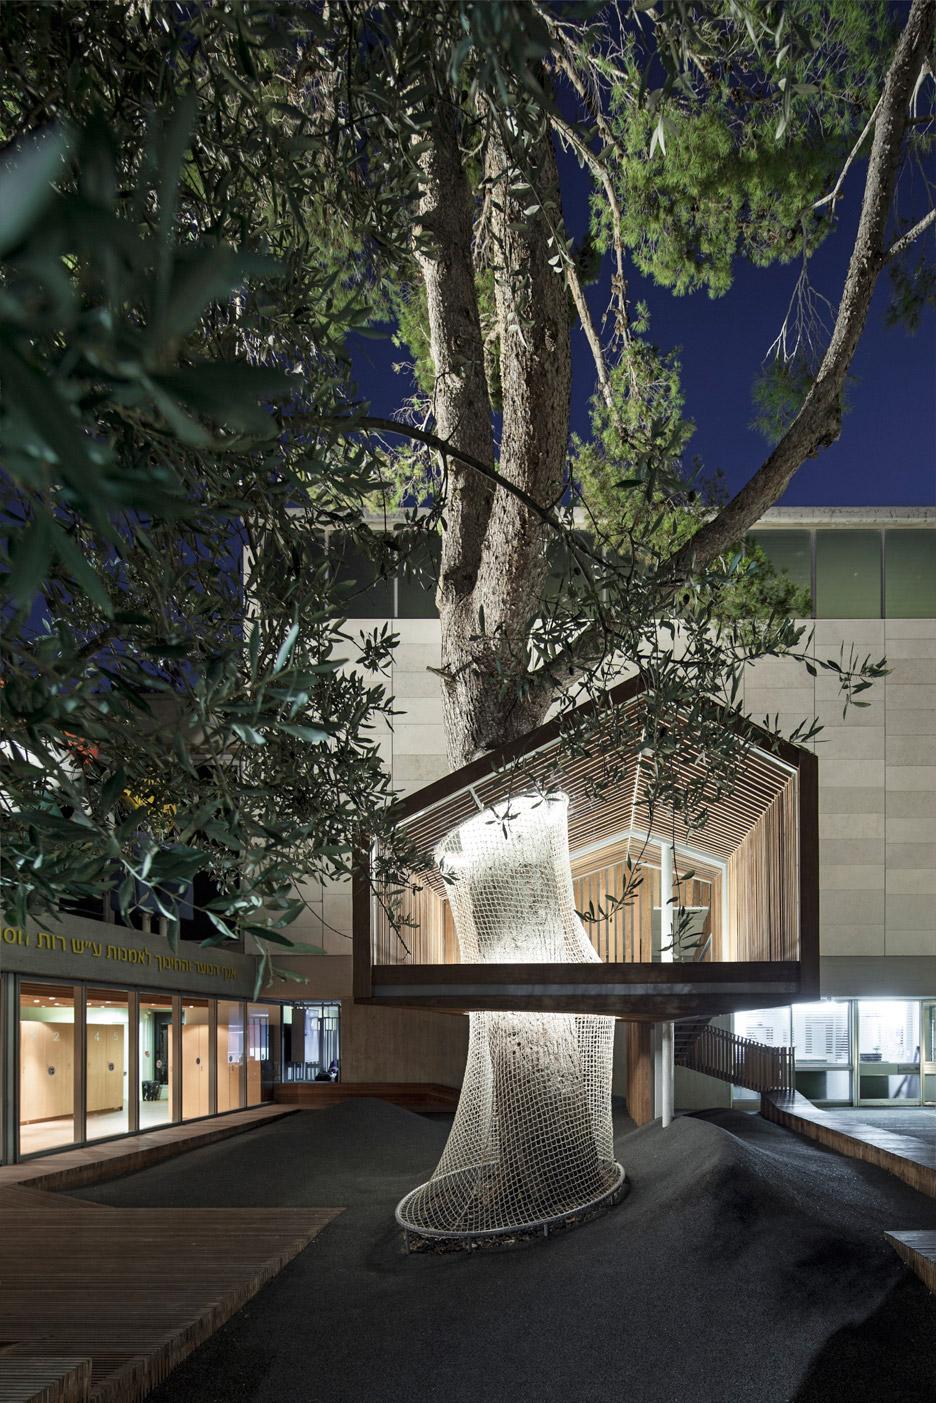 IMJ-tree-house-by-Ifat-Finkelman-and-Deborah-Warschawski_dezeen_936_25.jpg